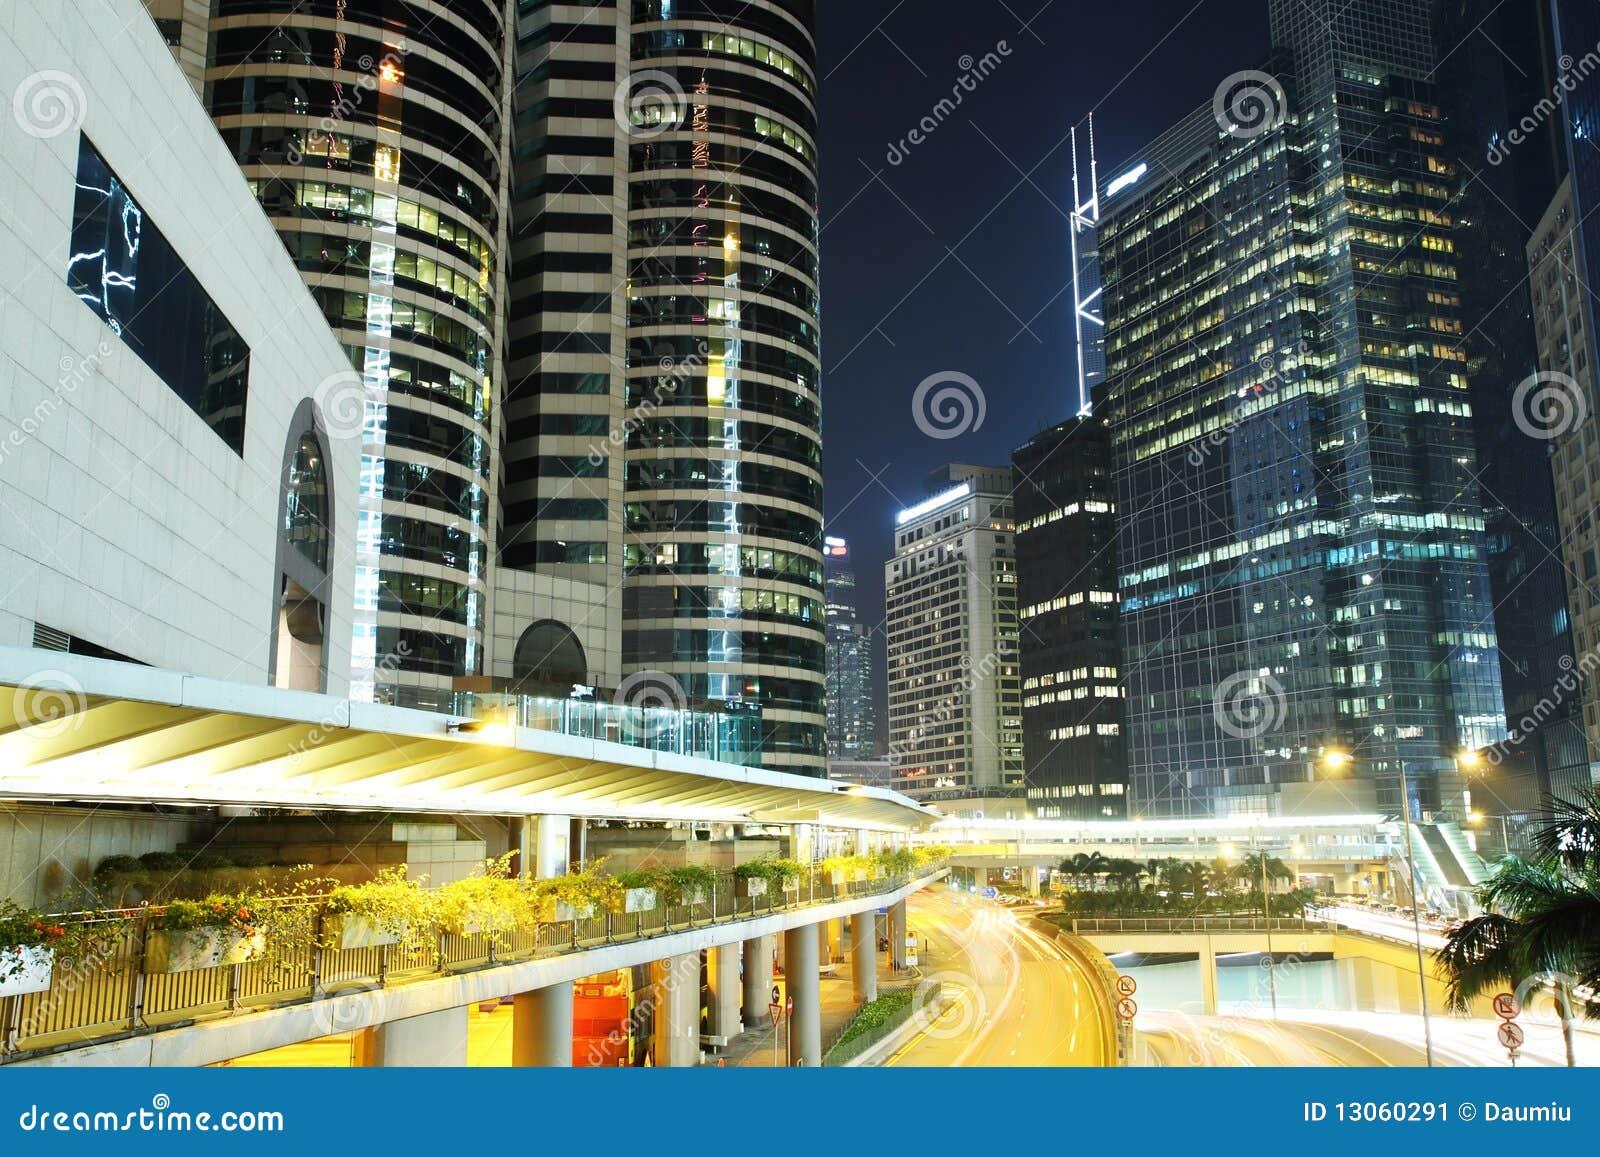 Business District At Night. Hong Kong. Stock Image - Image ...